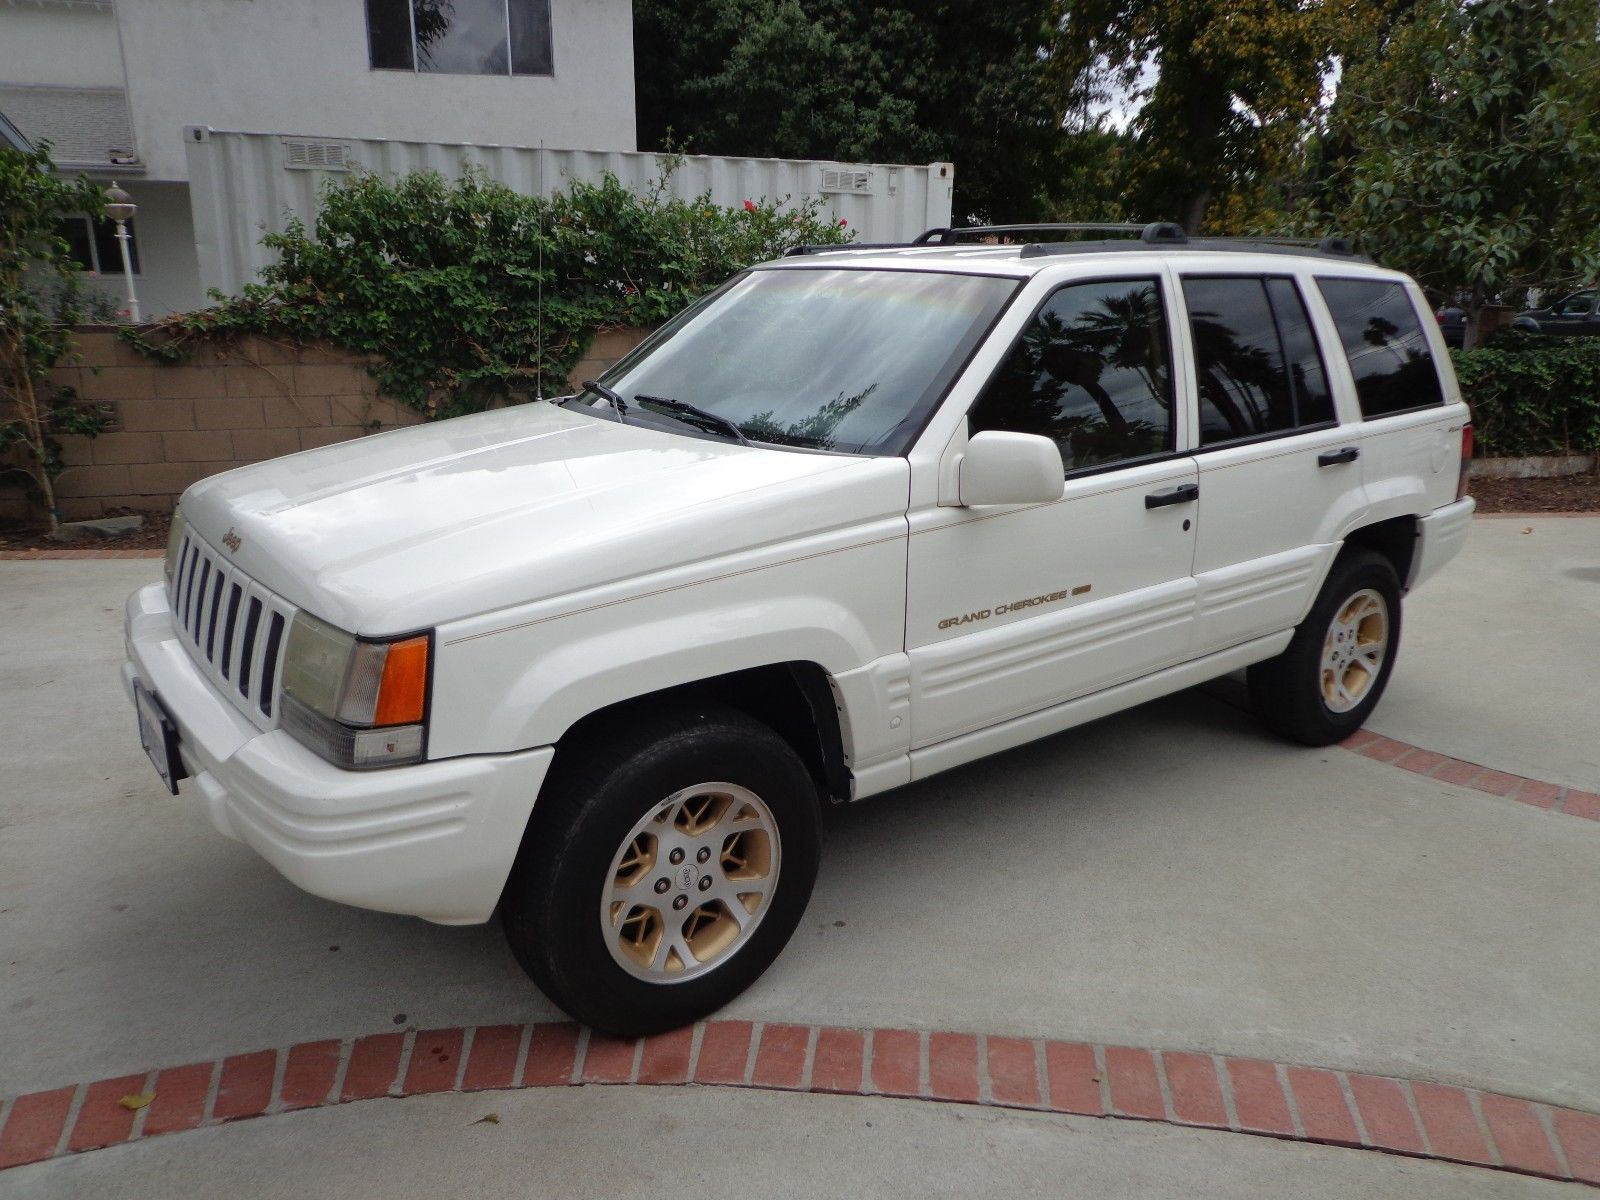 1997 Jeep Grand Cherokee Limited 1997 Jeep Grand Cherokee ...